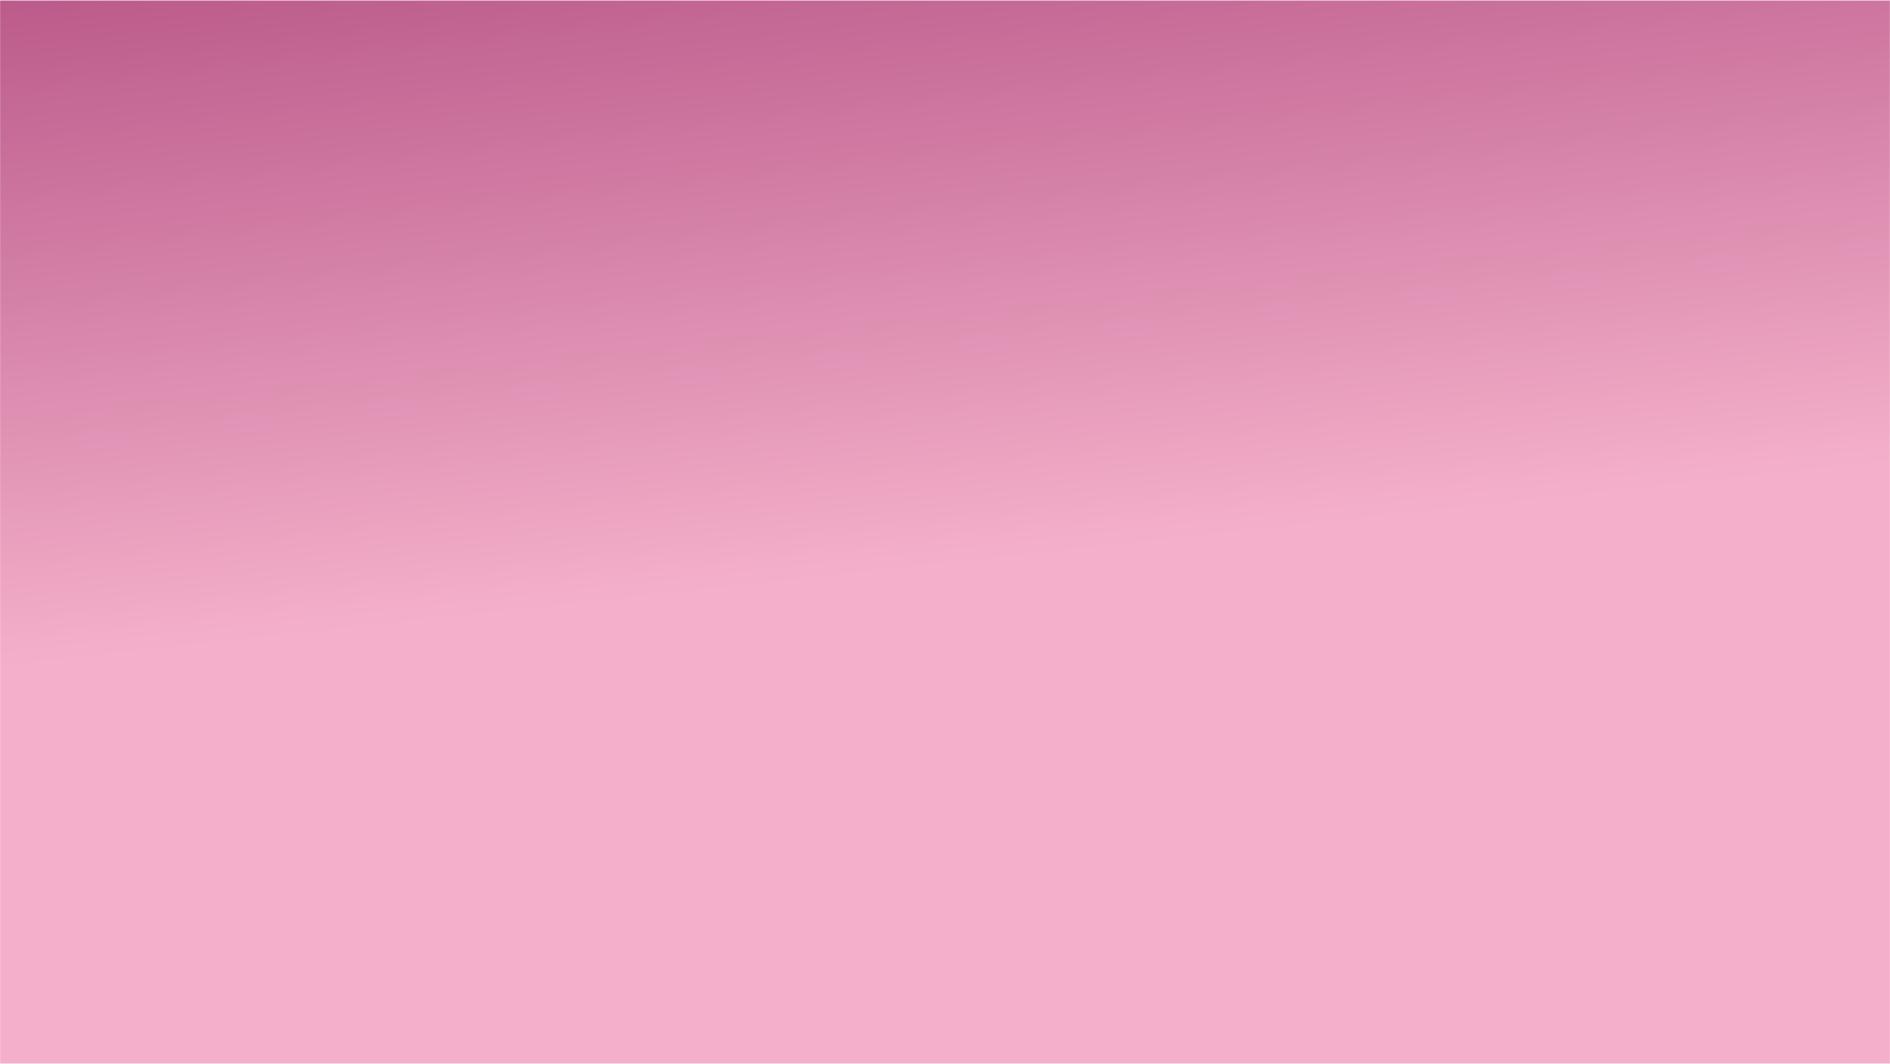 fondo-promo-pink-day-expobanner Fusco Mangimi | Fusco Mangimi per animali